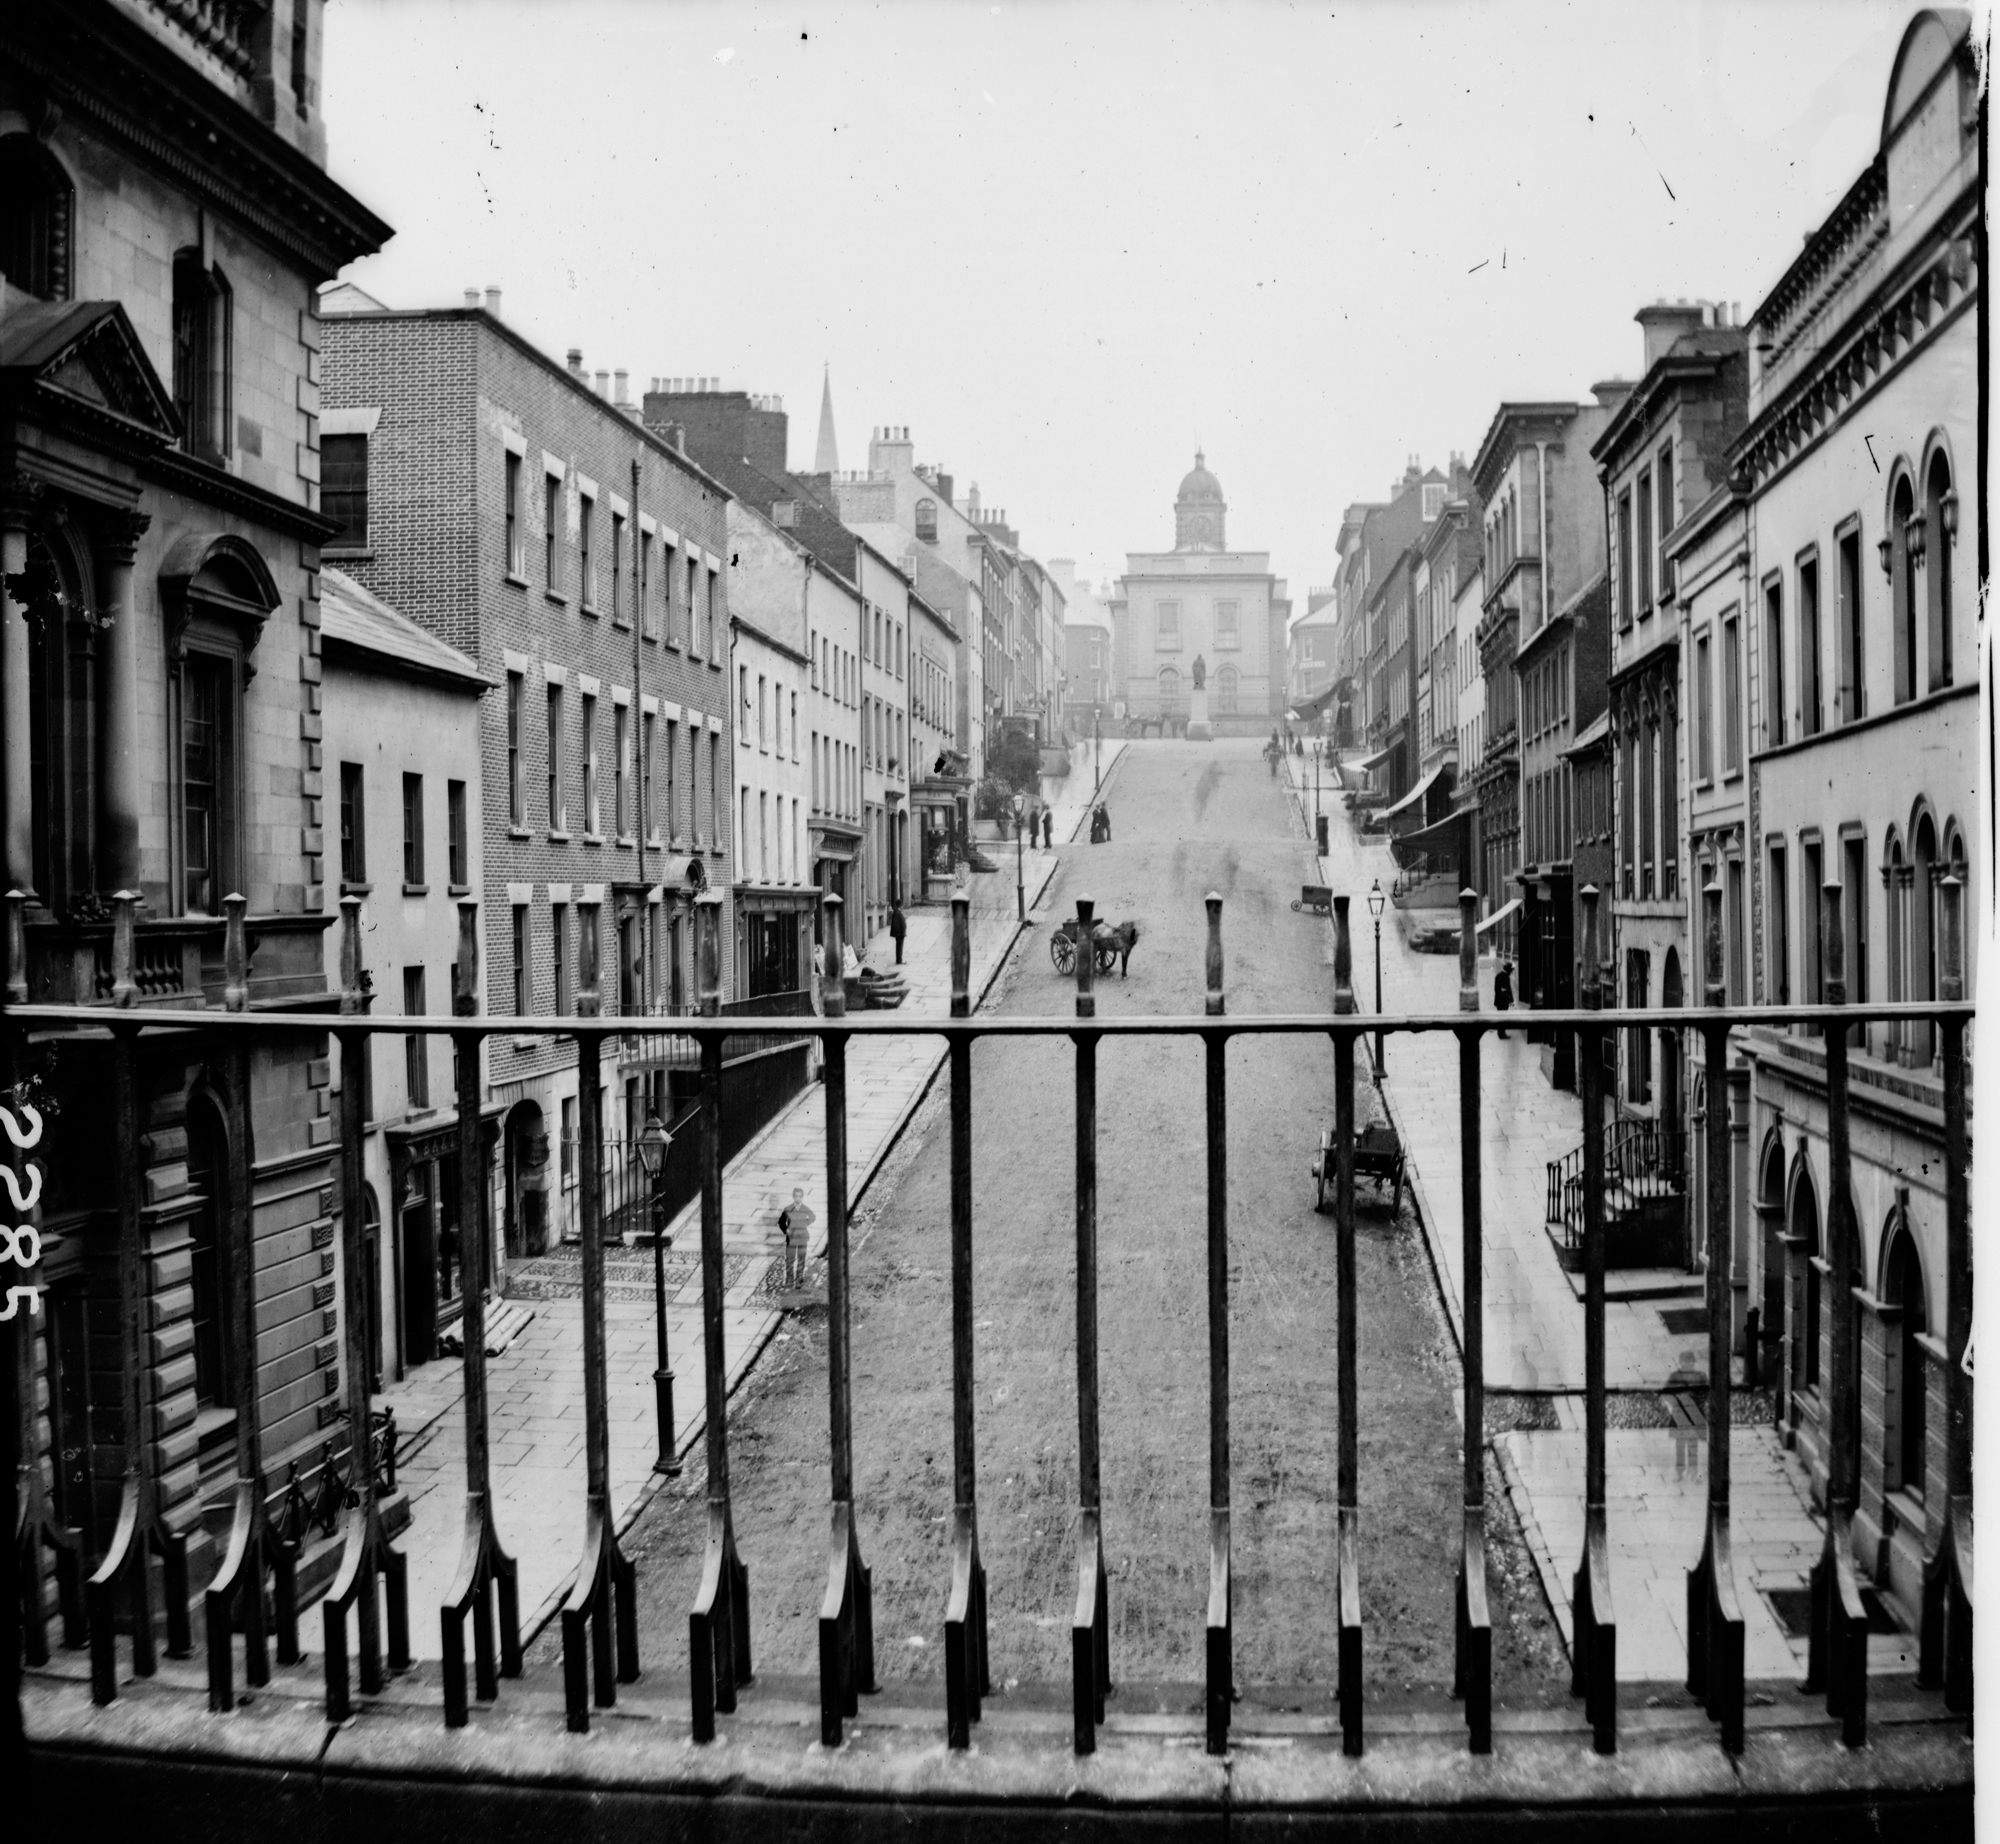 Shipquay Street Derry/Londonderry.